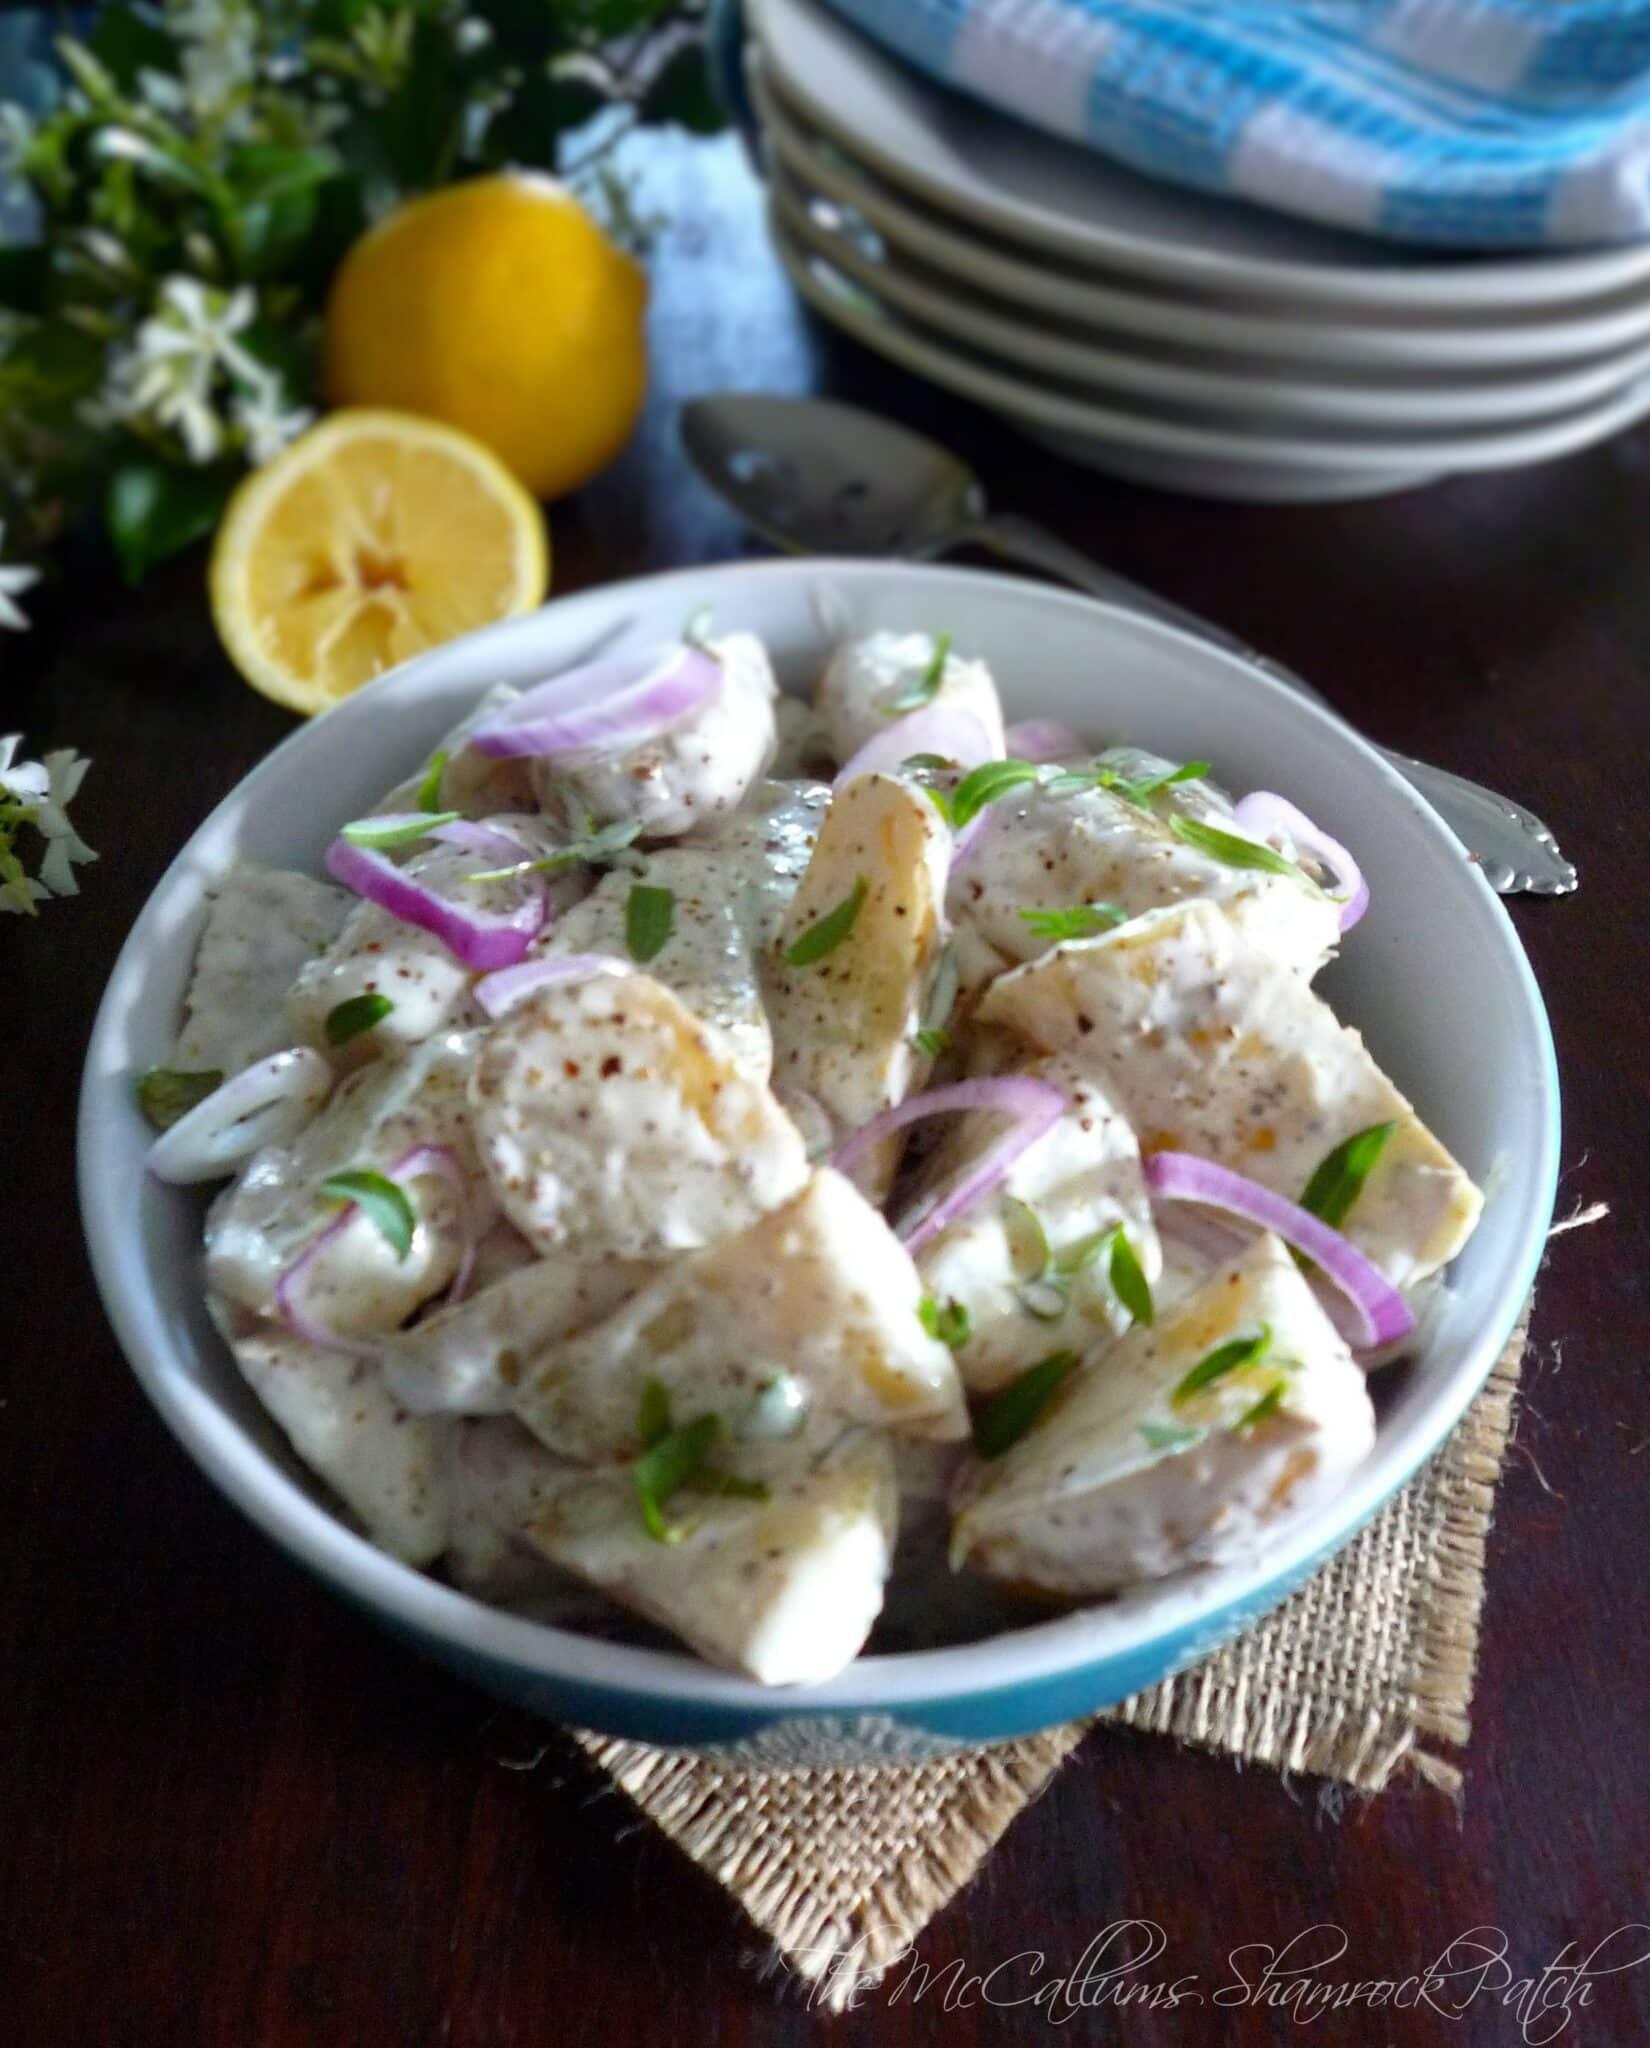 Lemony Tarragon Fingerling Potato Salad